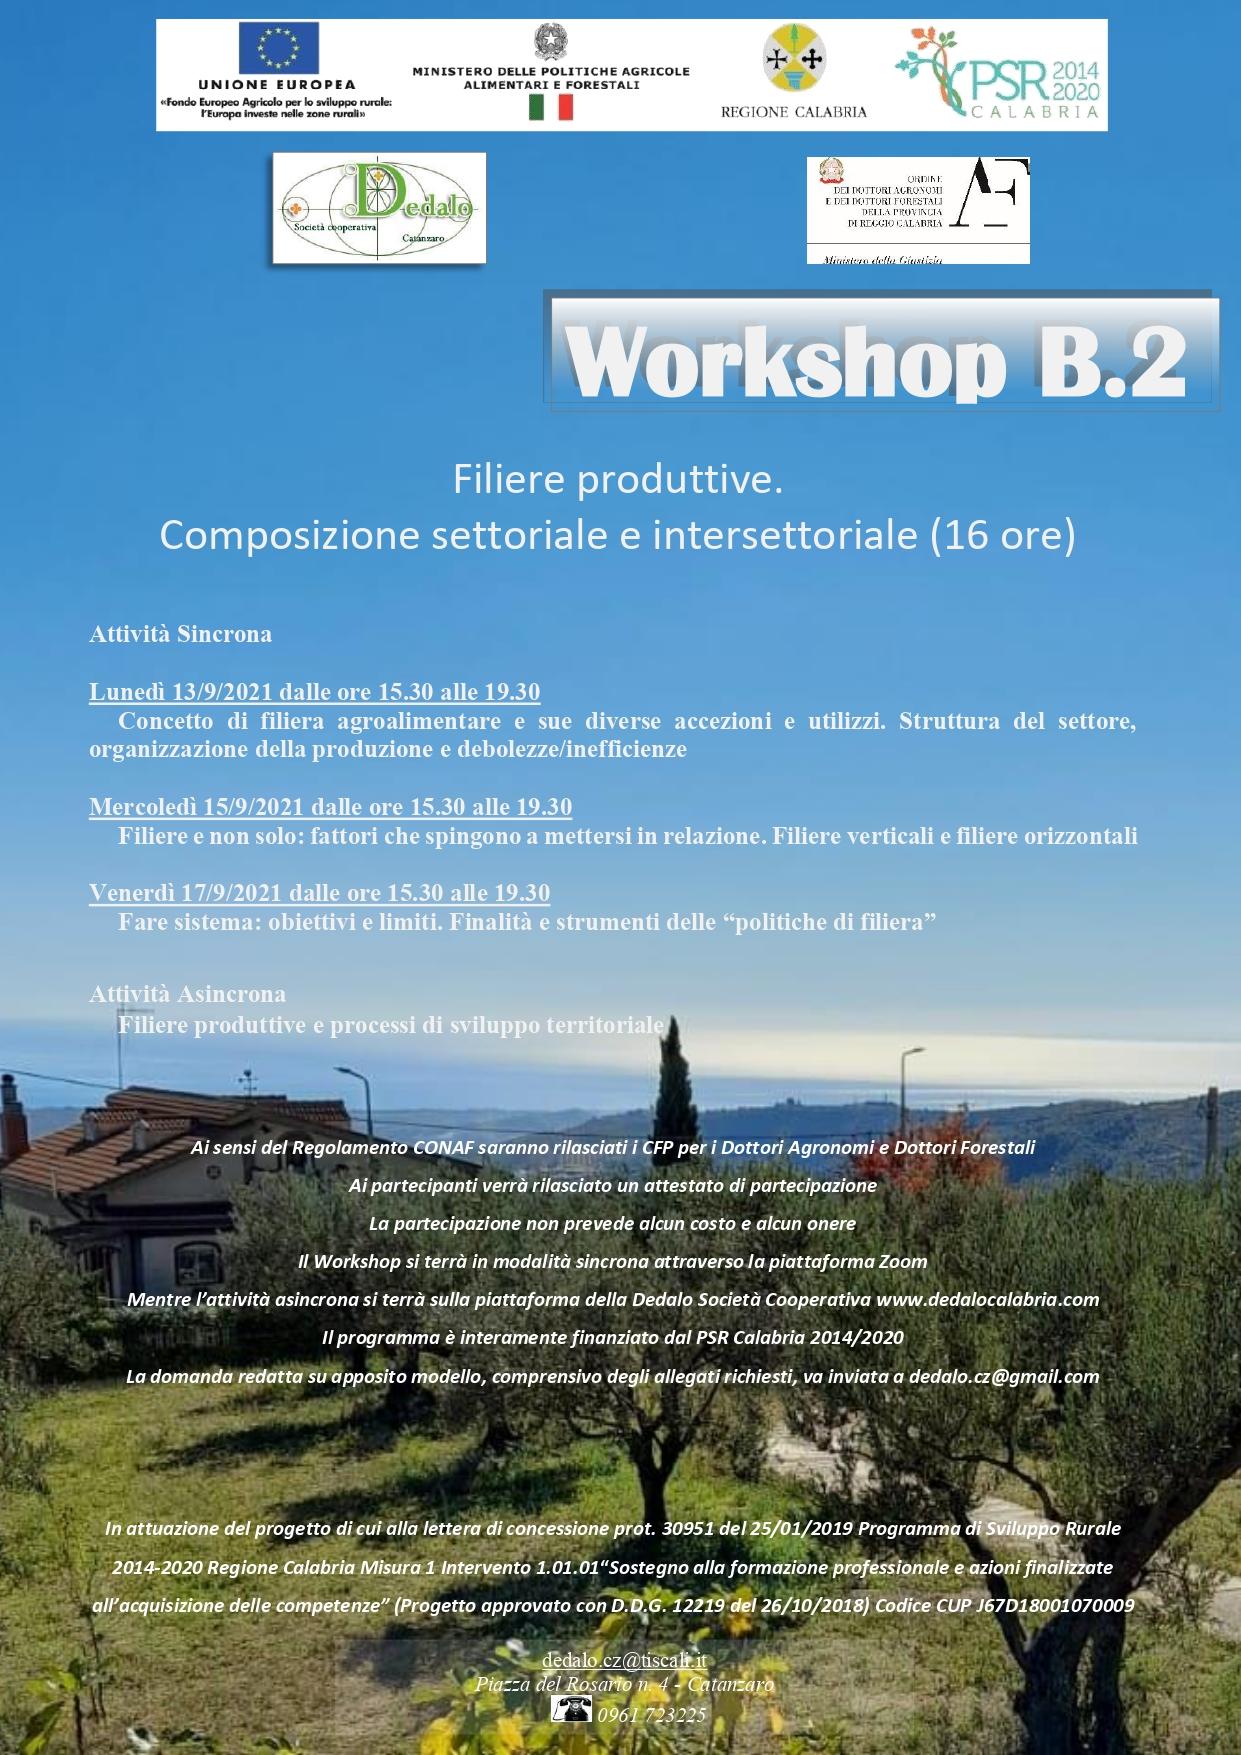 WORKSHOP B.2 Filiere produttive. Composizione settoriale e intersettoriale